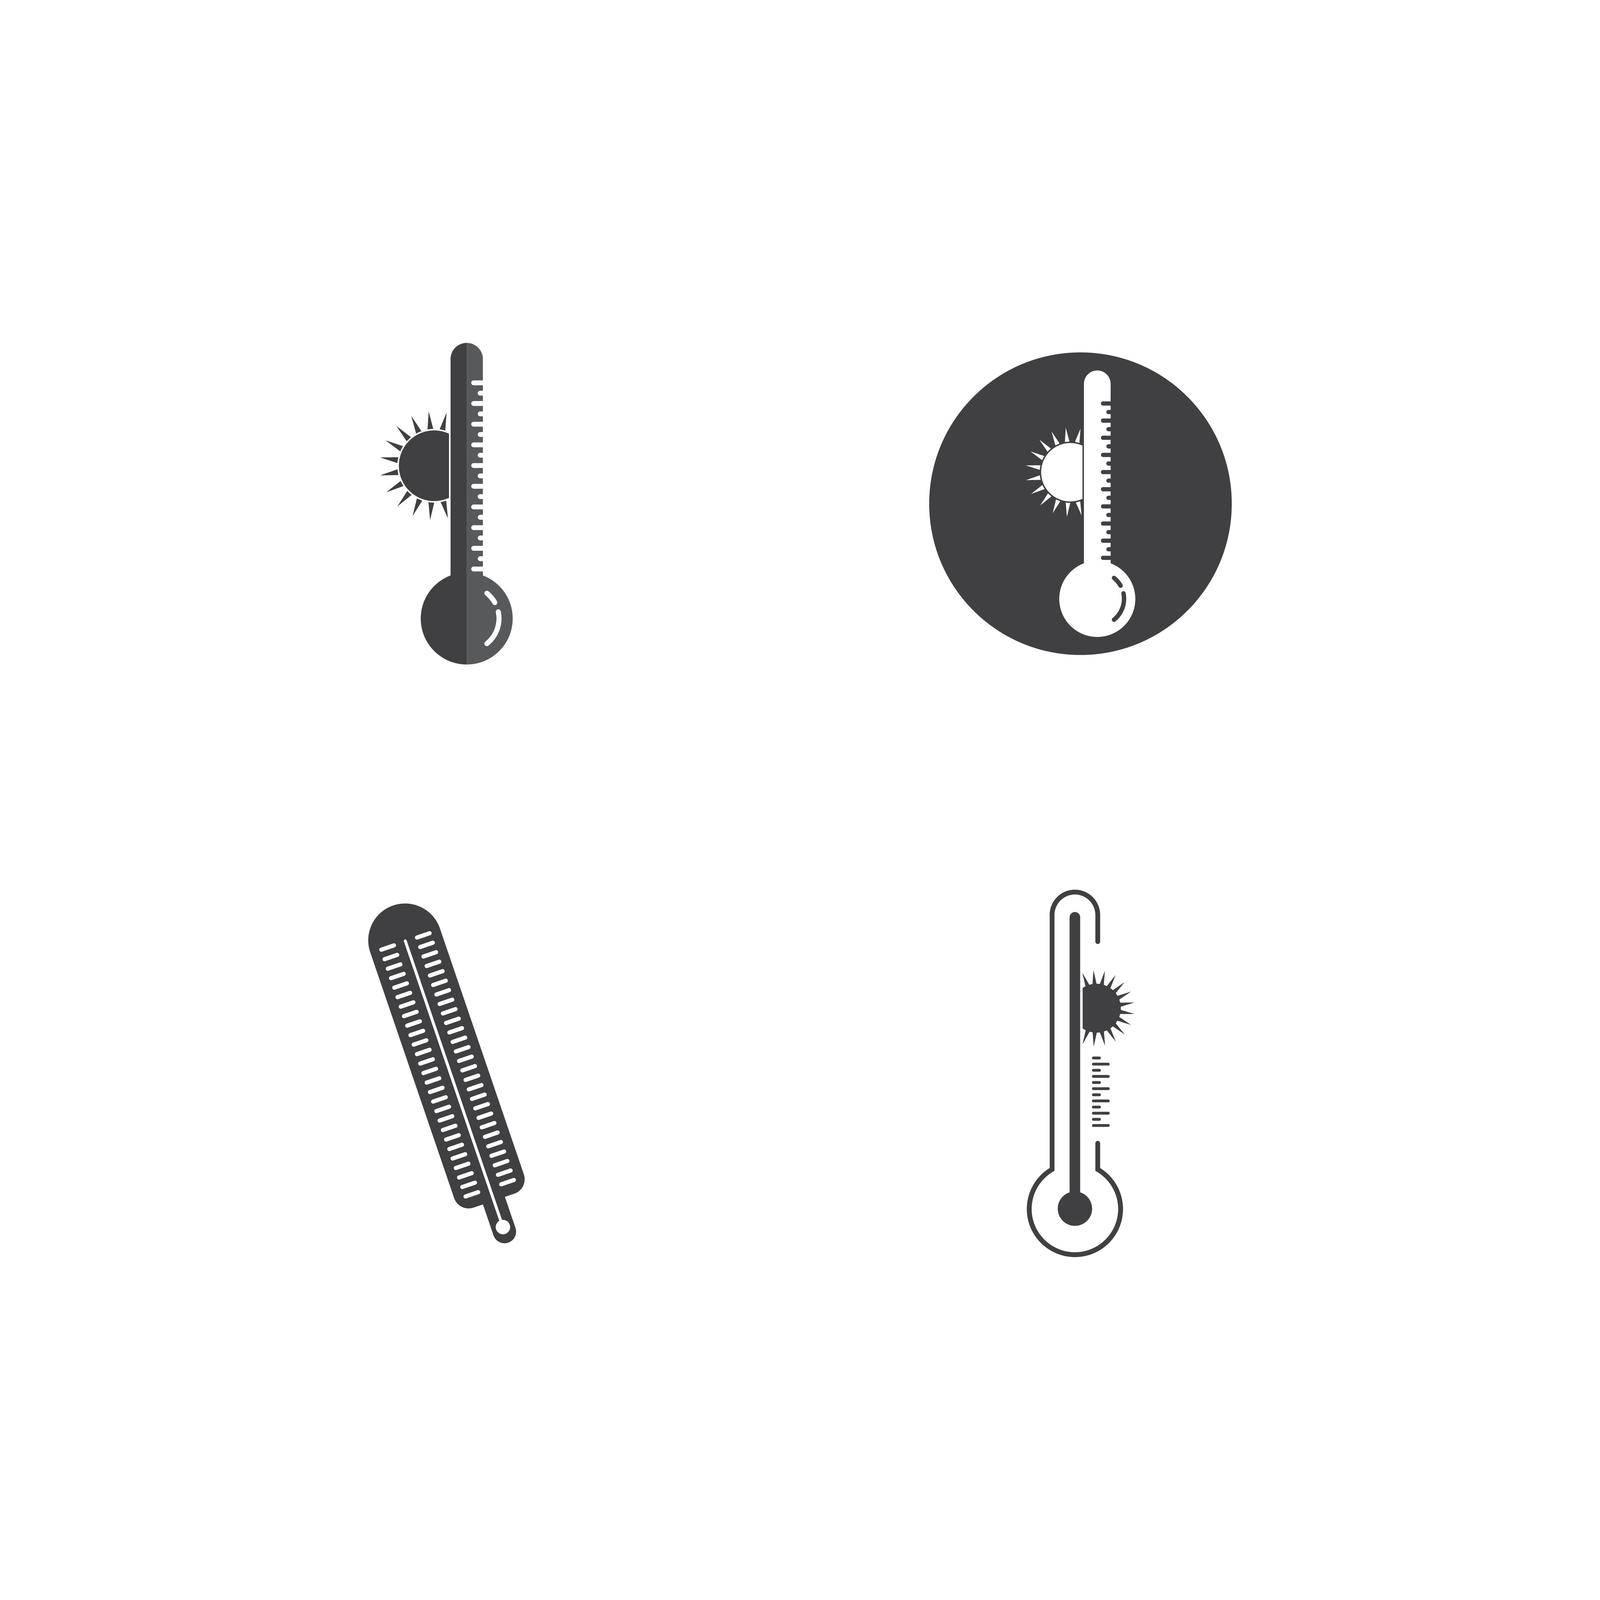 Thermometer Icon Vector Design Template